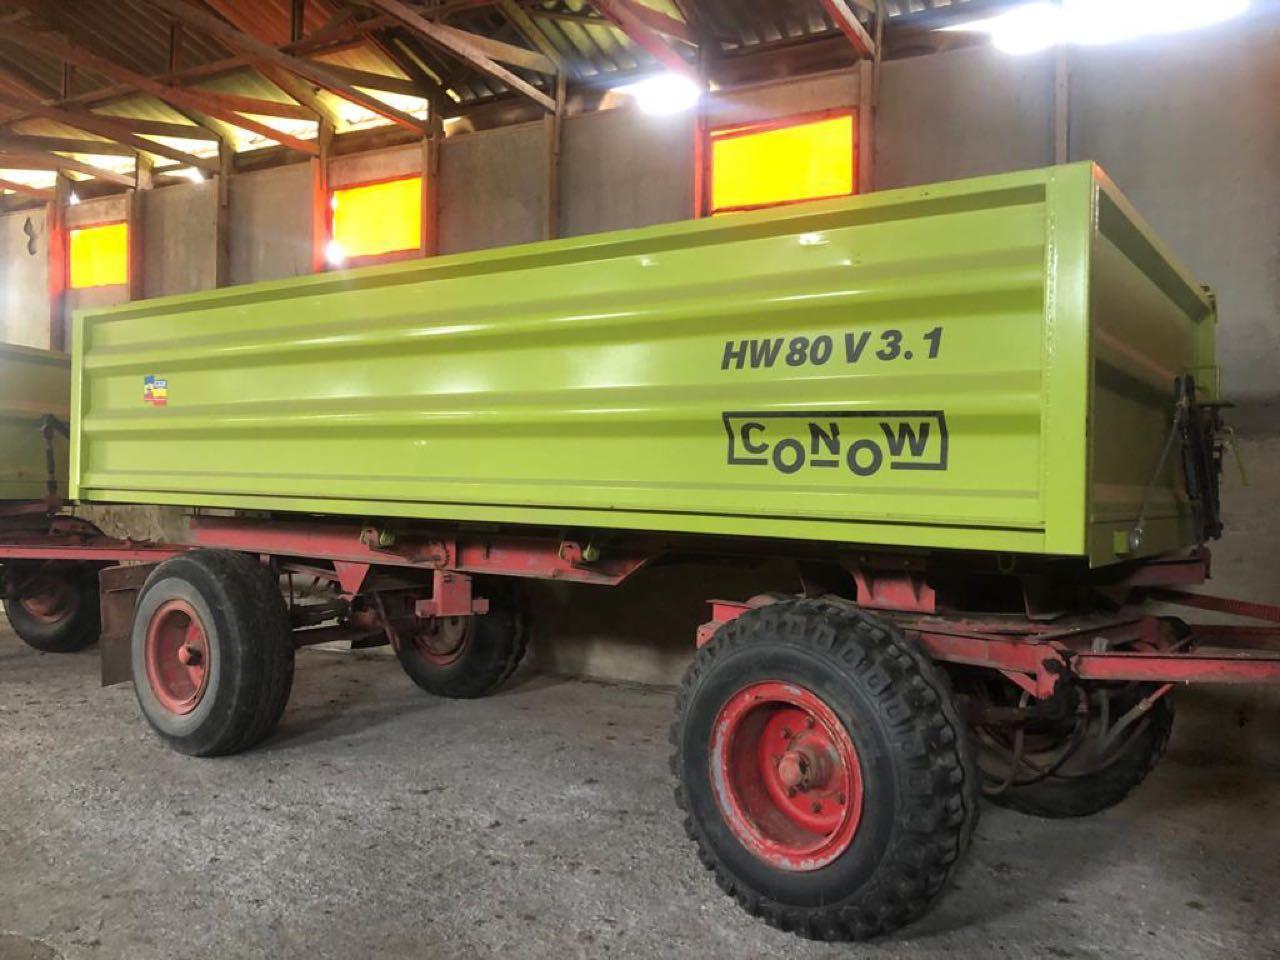 Fortschritt Conow HW 80 V3.1 Zug